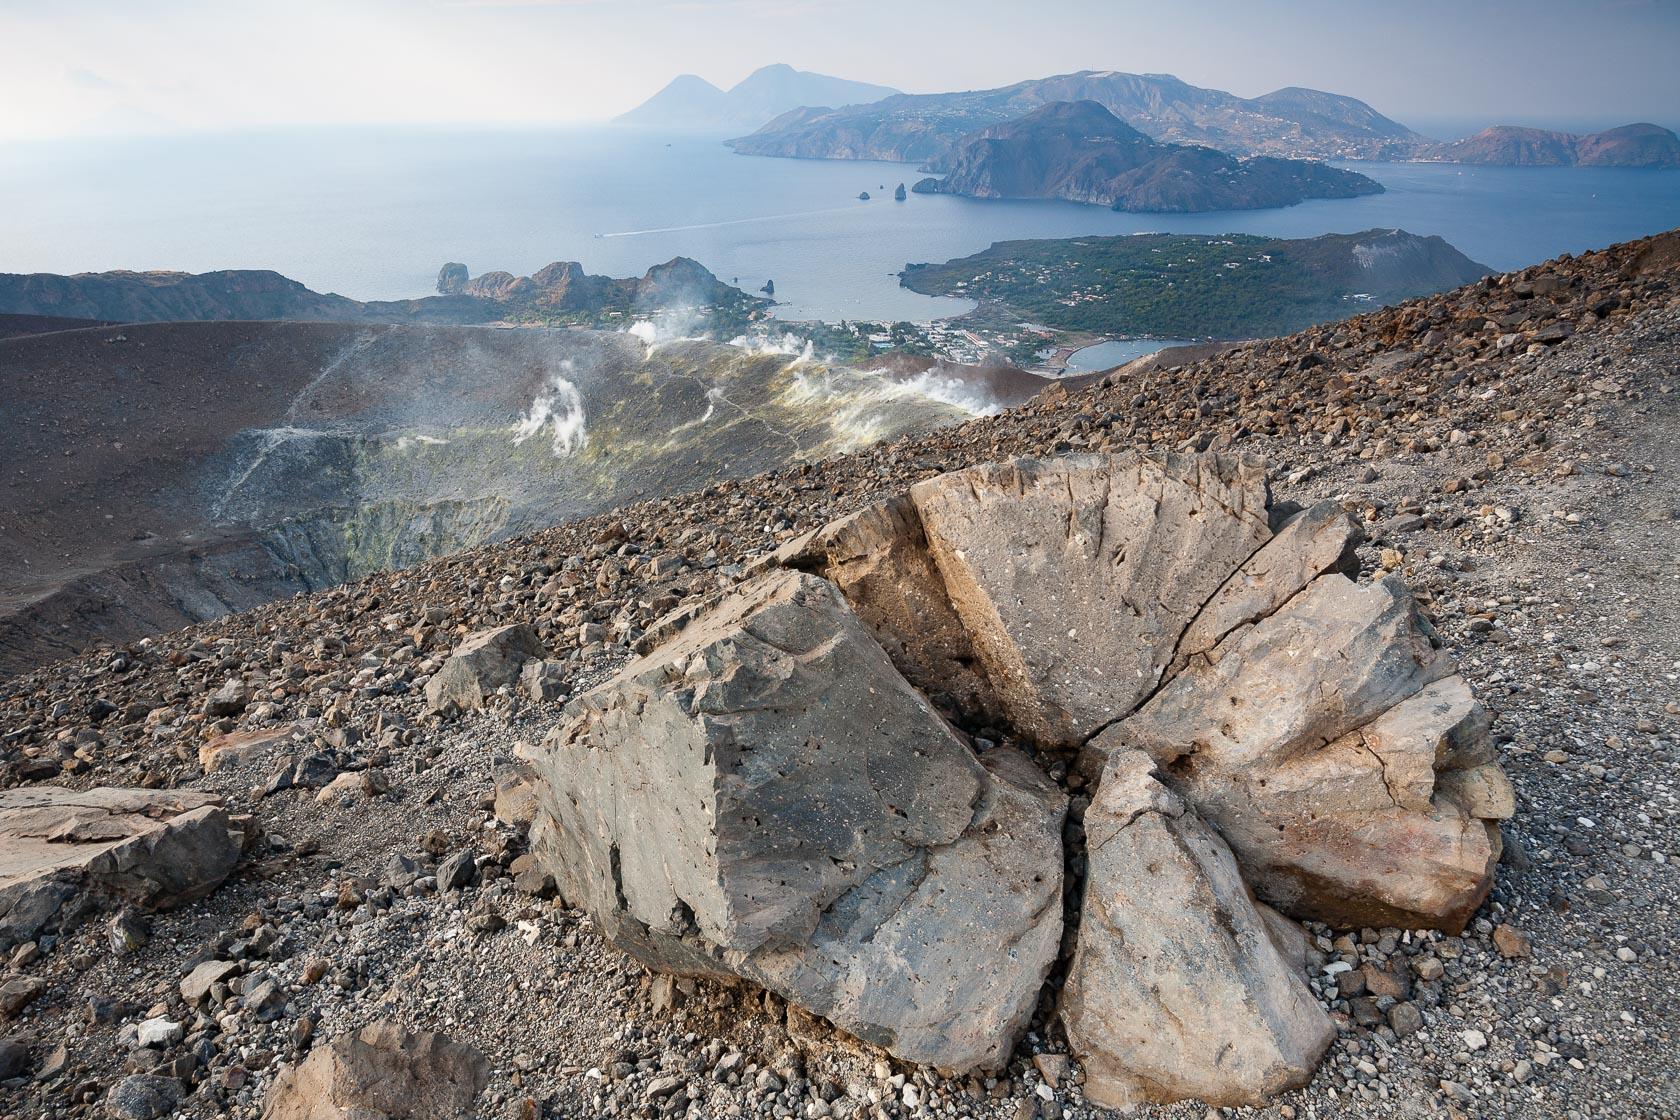 Bombe volcanique sur le volcan Vulcano